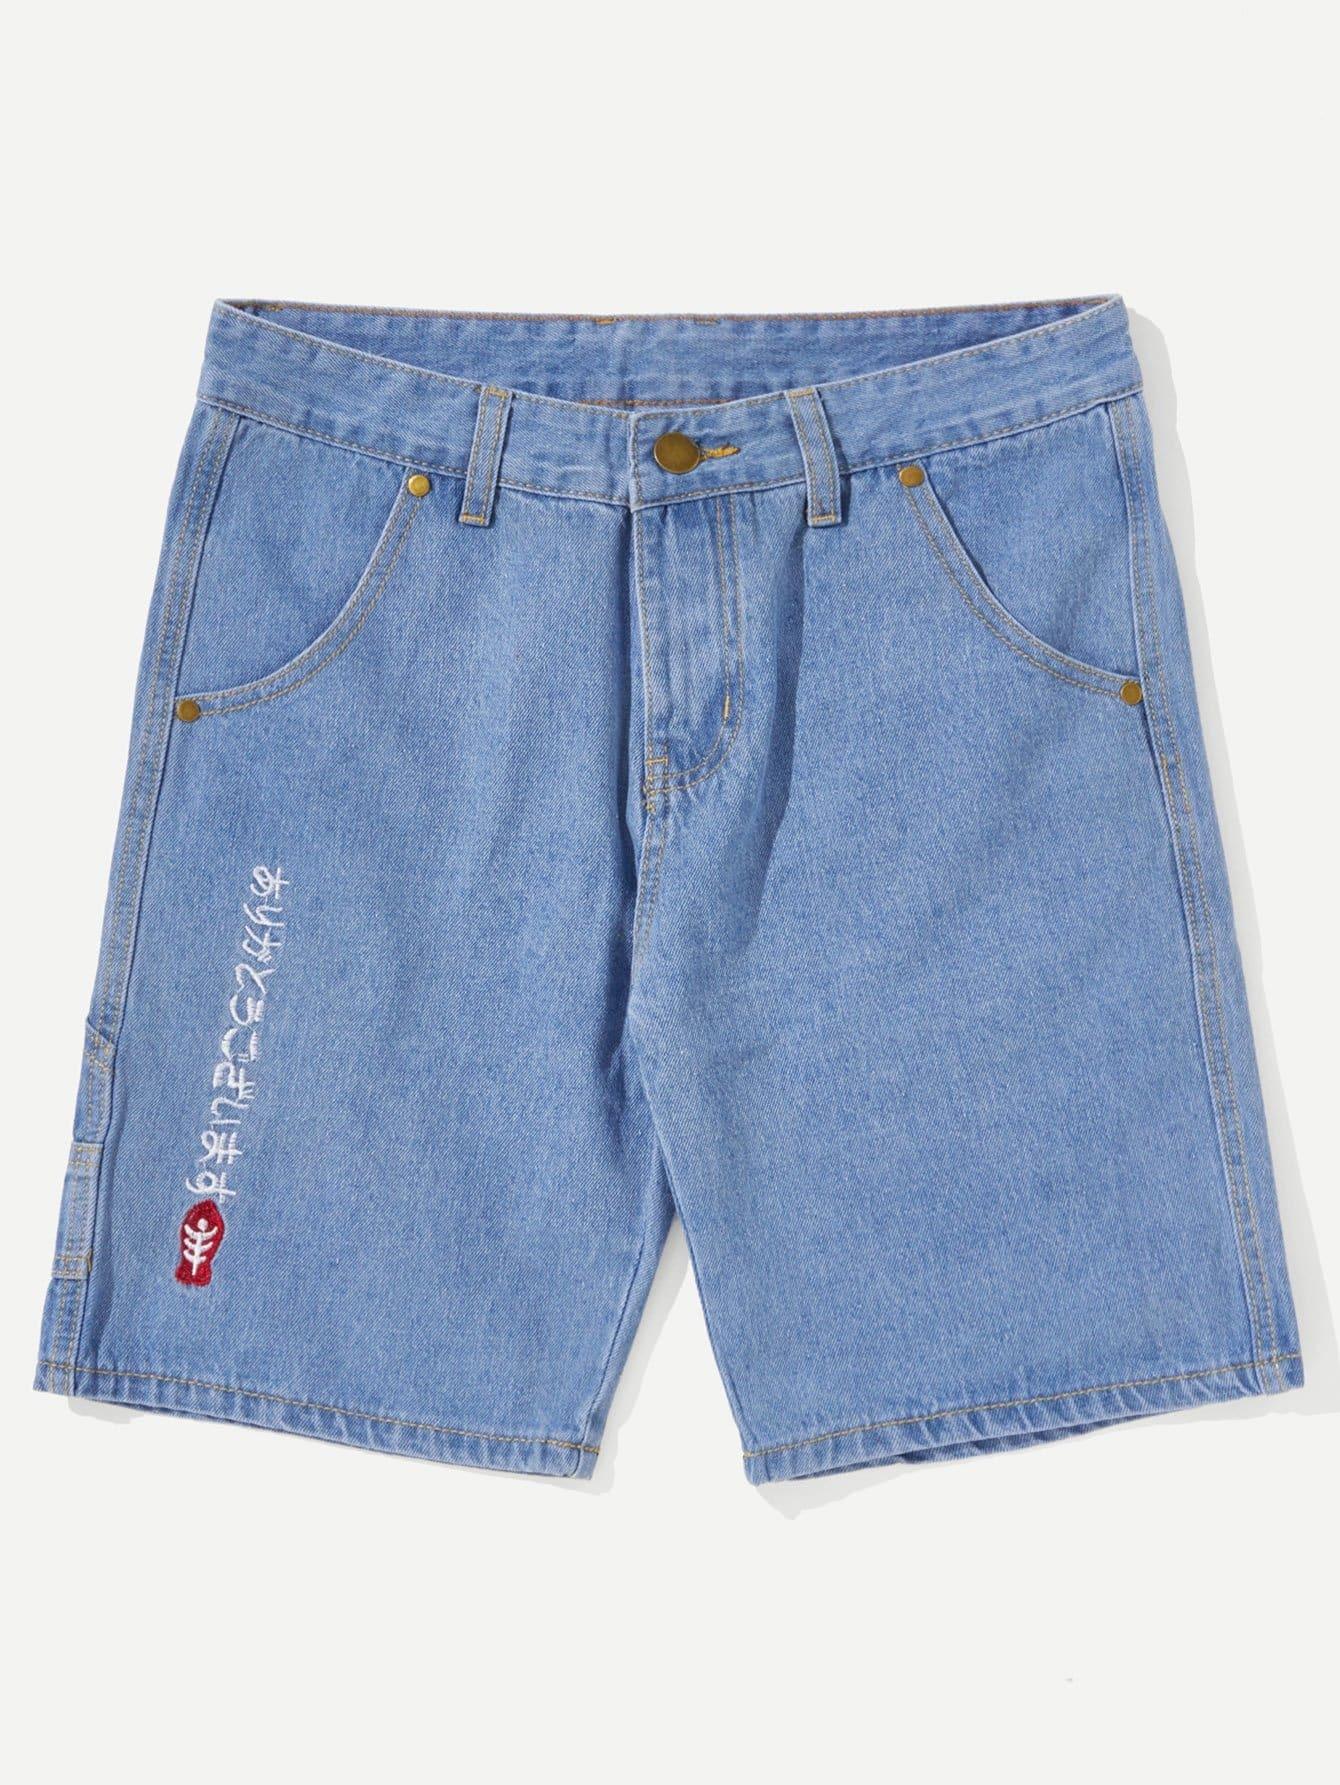 цена на Men Embroidered Denim Shorts